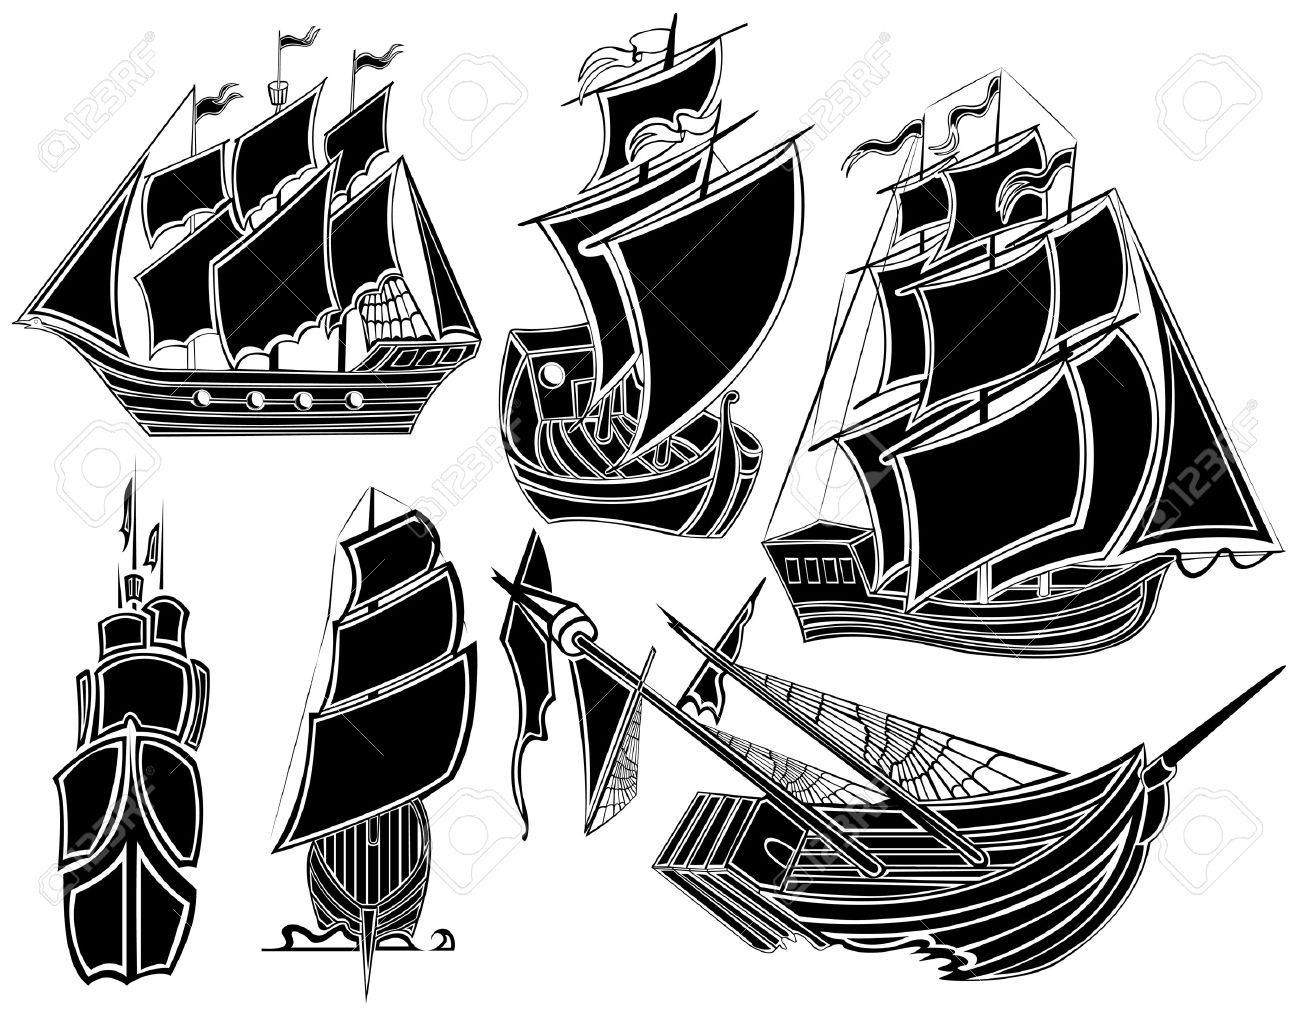 Barco Pirata Barco Silueta Brújula Ilustraciones Vectoriales, Clip ...